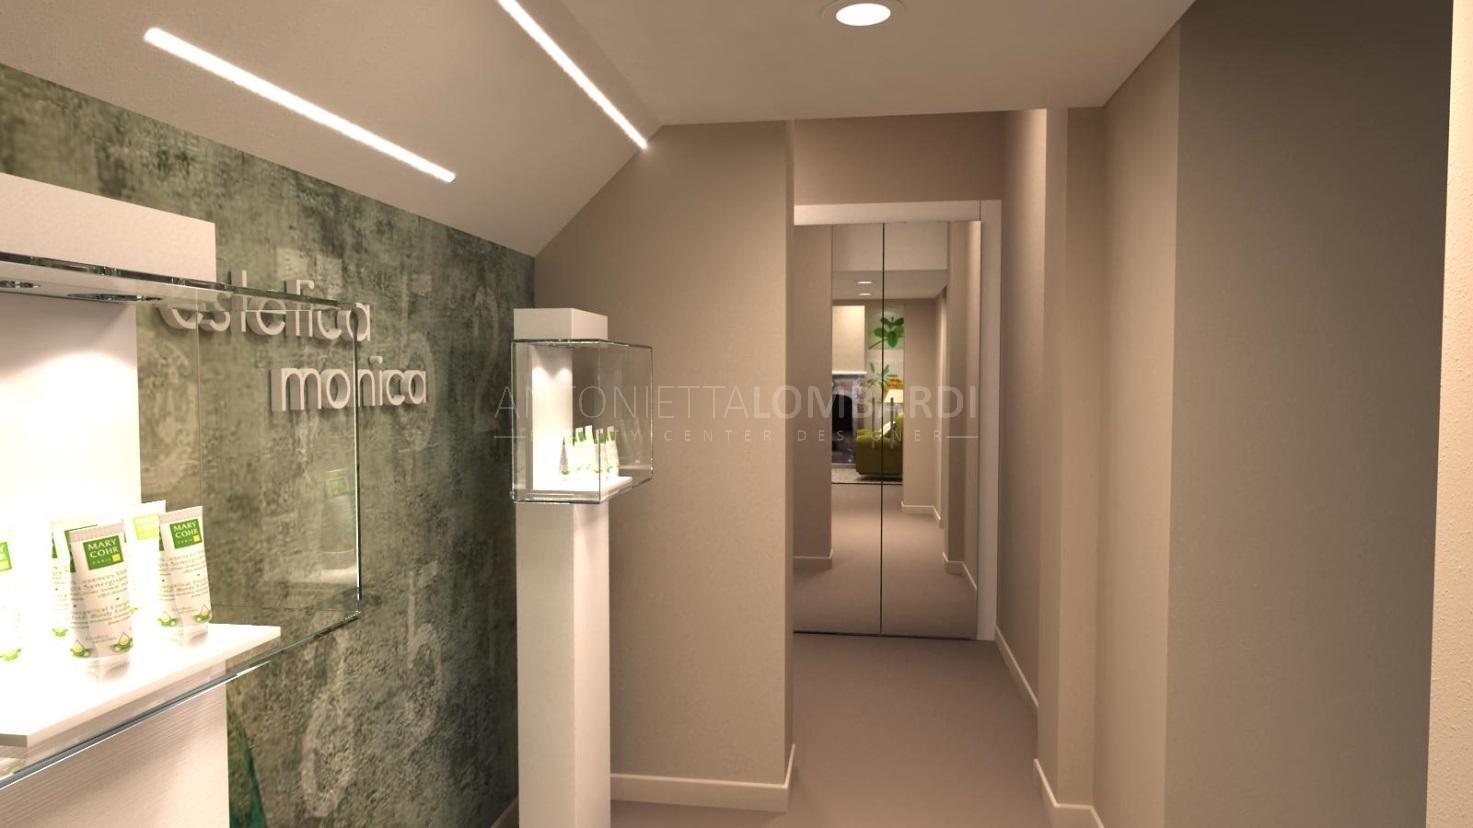 antonietta-lombardi-ingresso-reception-dopo-centro-estetico-01